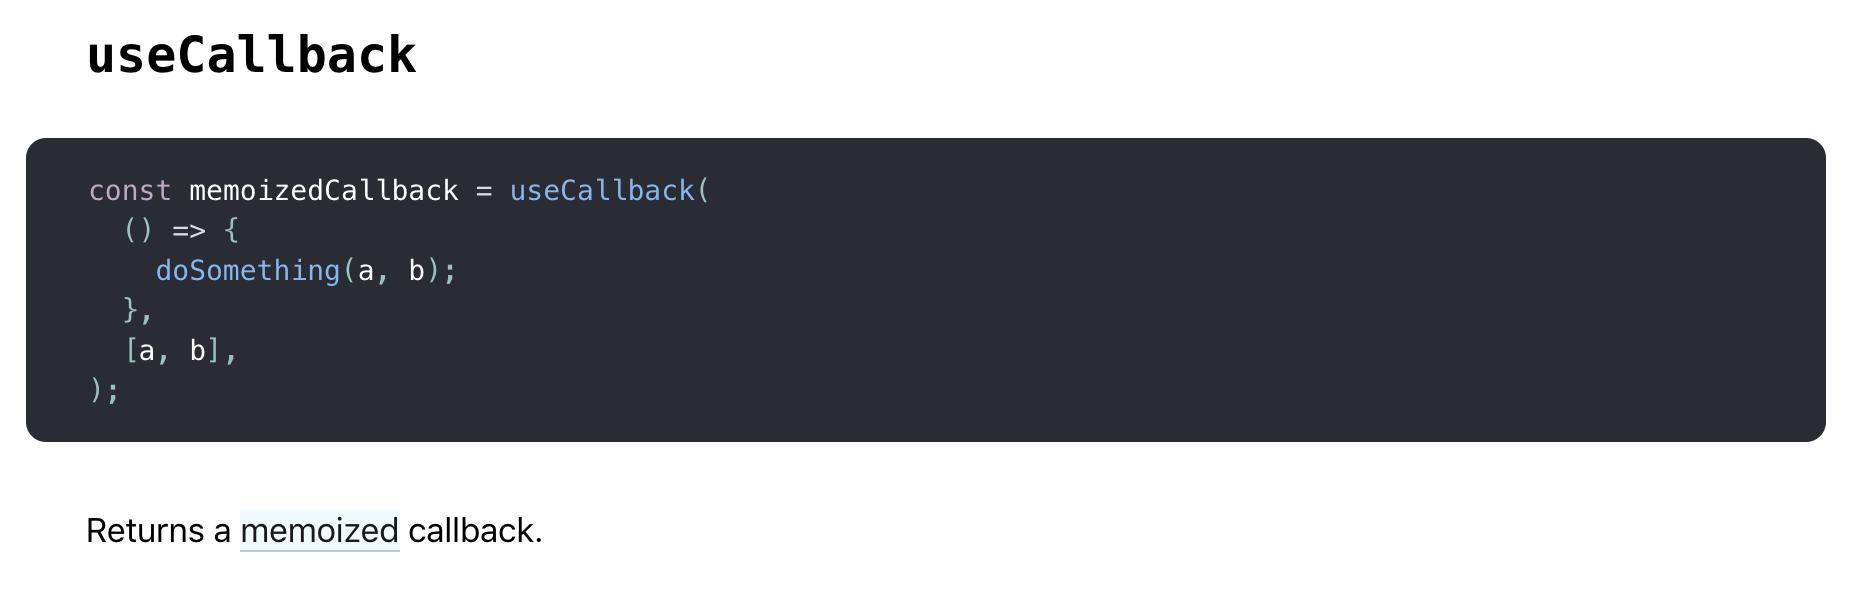 useCallback_docs